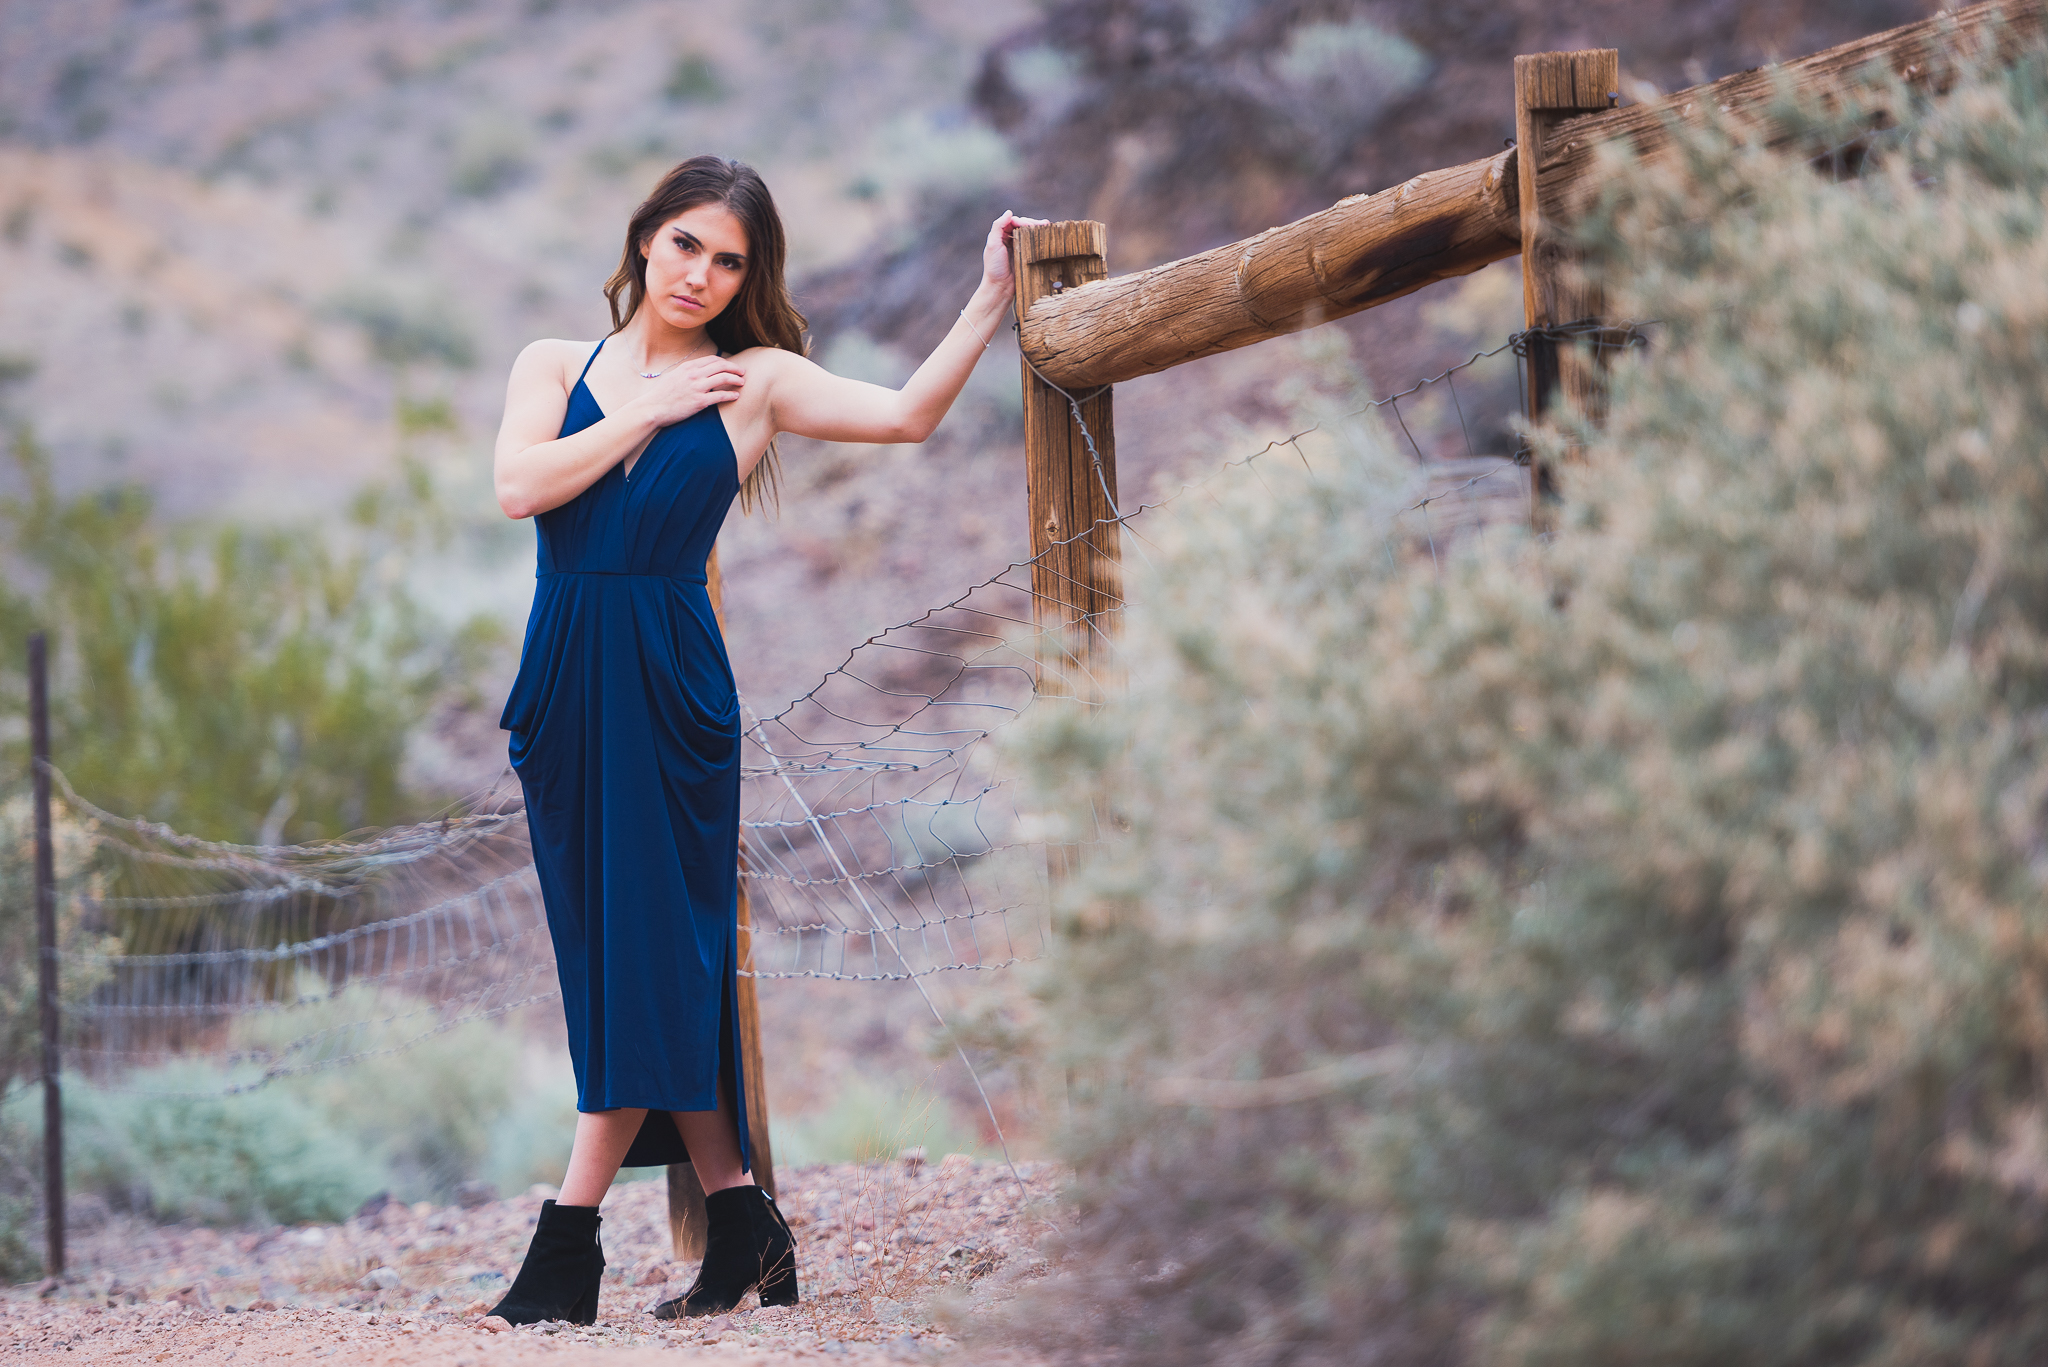 dusty-wooddell-arizona-portrait-photographer-parker-lake-havasu-1.jpg